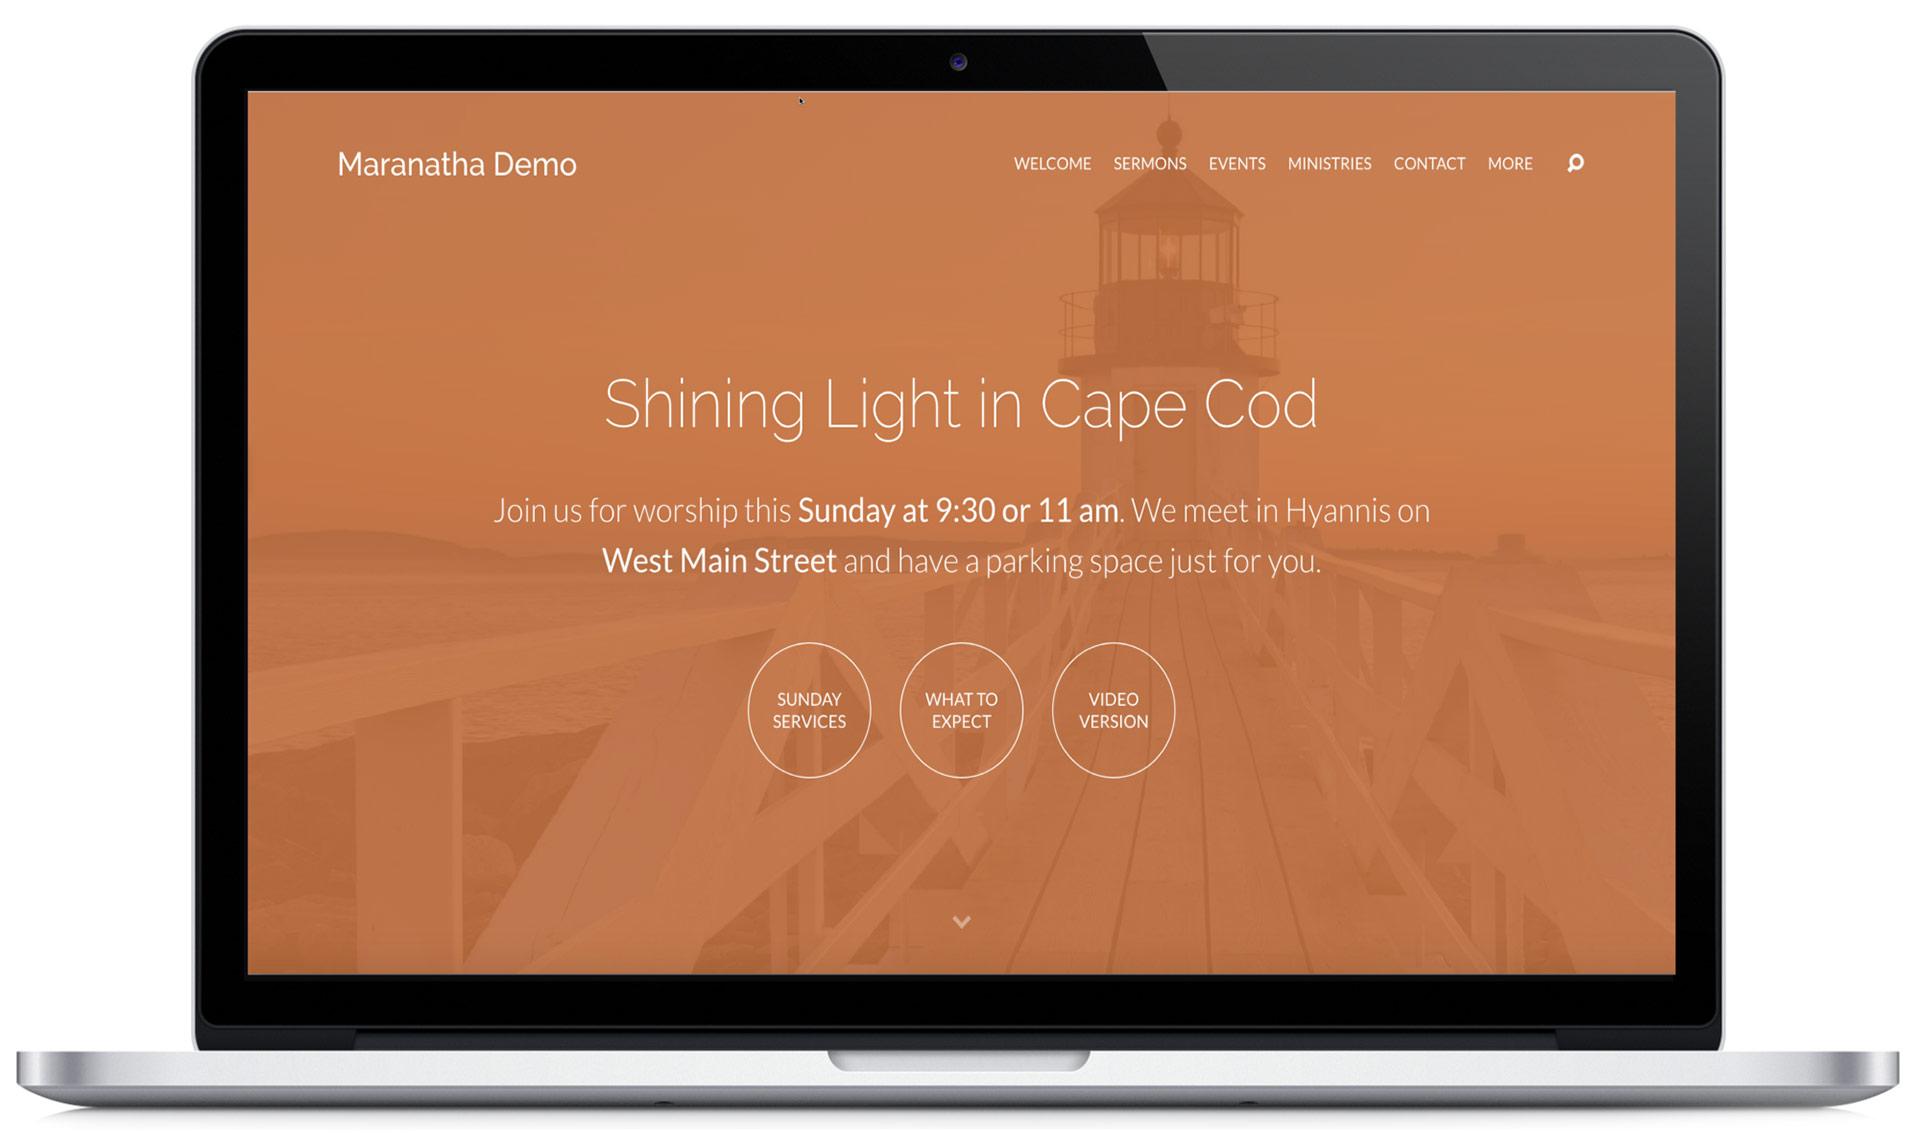 Maranatha Church Wordpress Theme from ChurchThemes.com